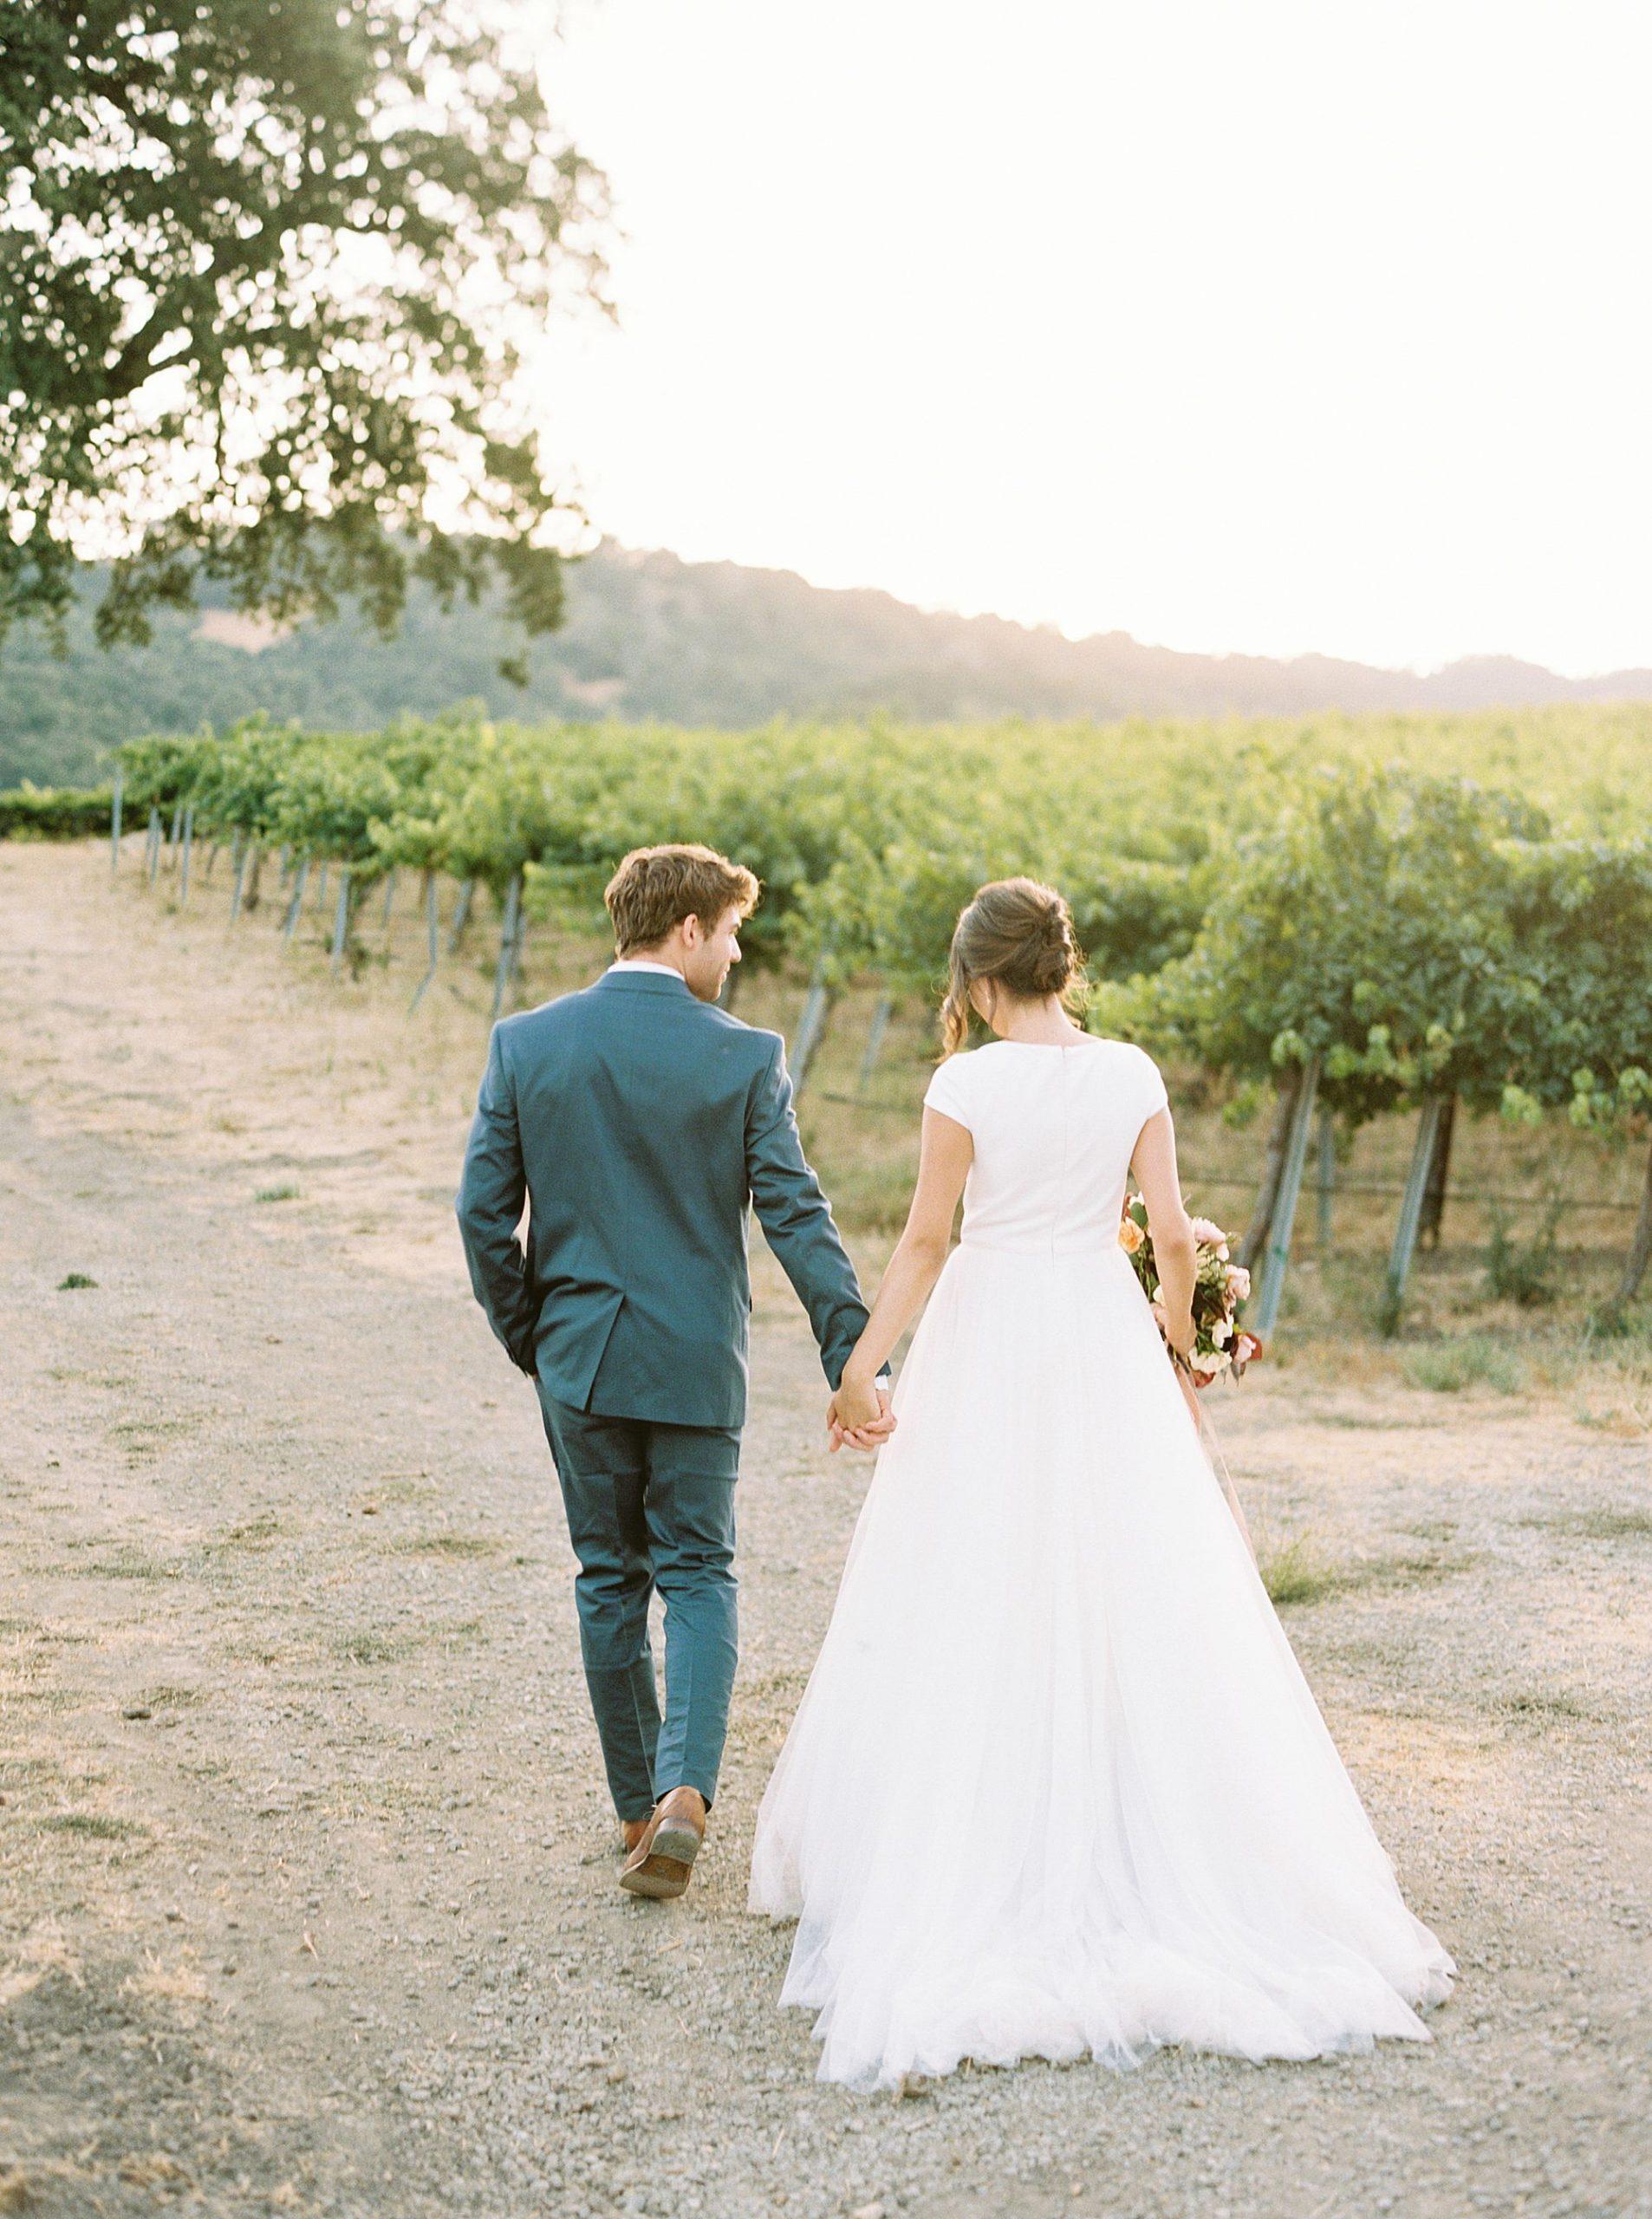 HammerSky Wedding Inspiration Featured on Hey Wedding Lady with Vanessa Noel Events - Ashley Baumgartner - SLO Wedding Photographer_0024.jpg